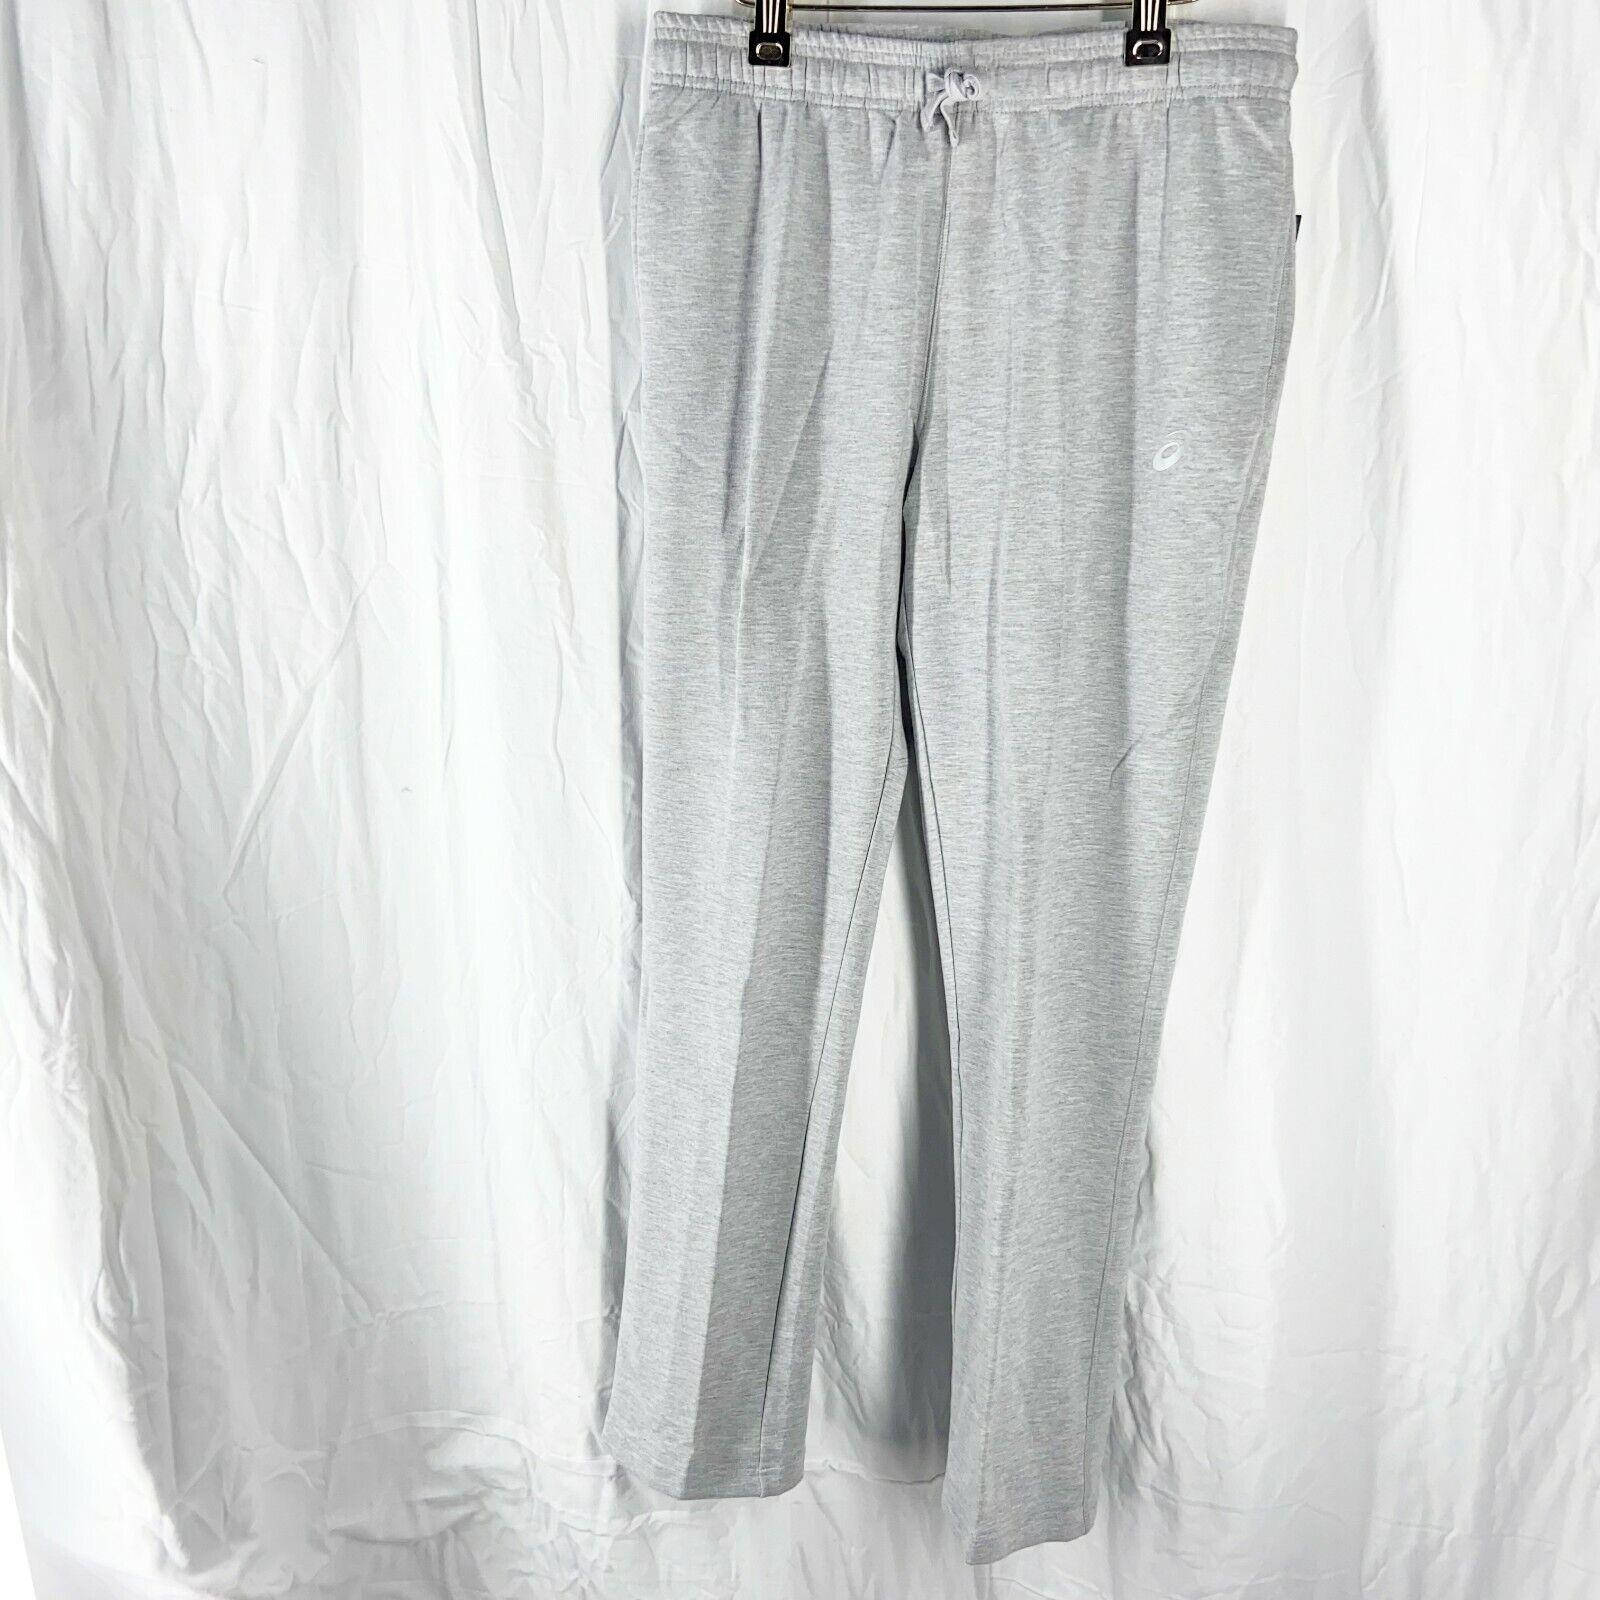 ASICS Womens Everyday Sweatpants Gray Size L